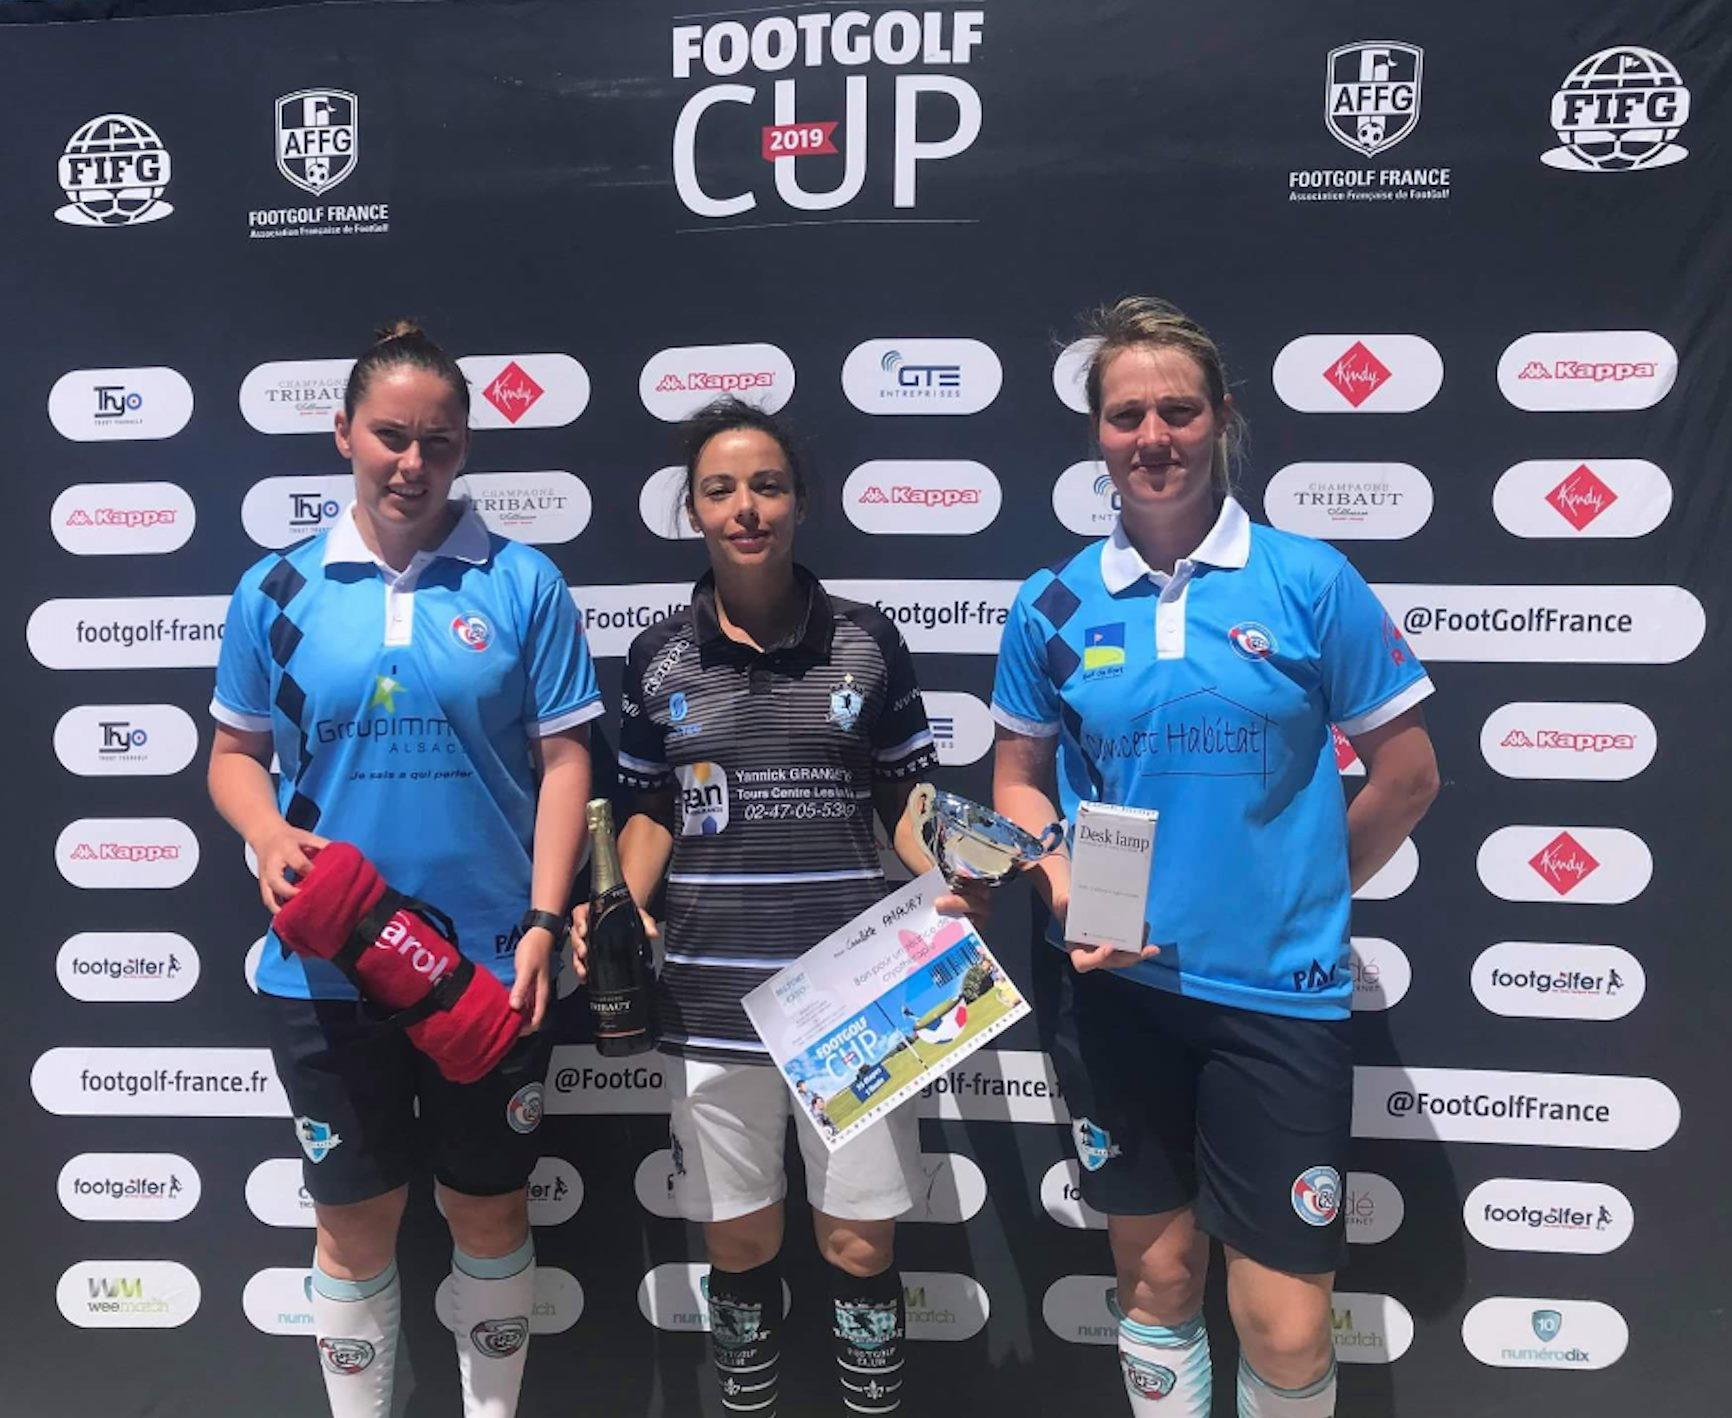 Footgolf CUP ROUGEMONT Juillet 2020